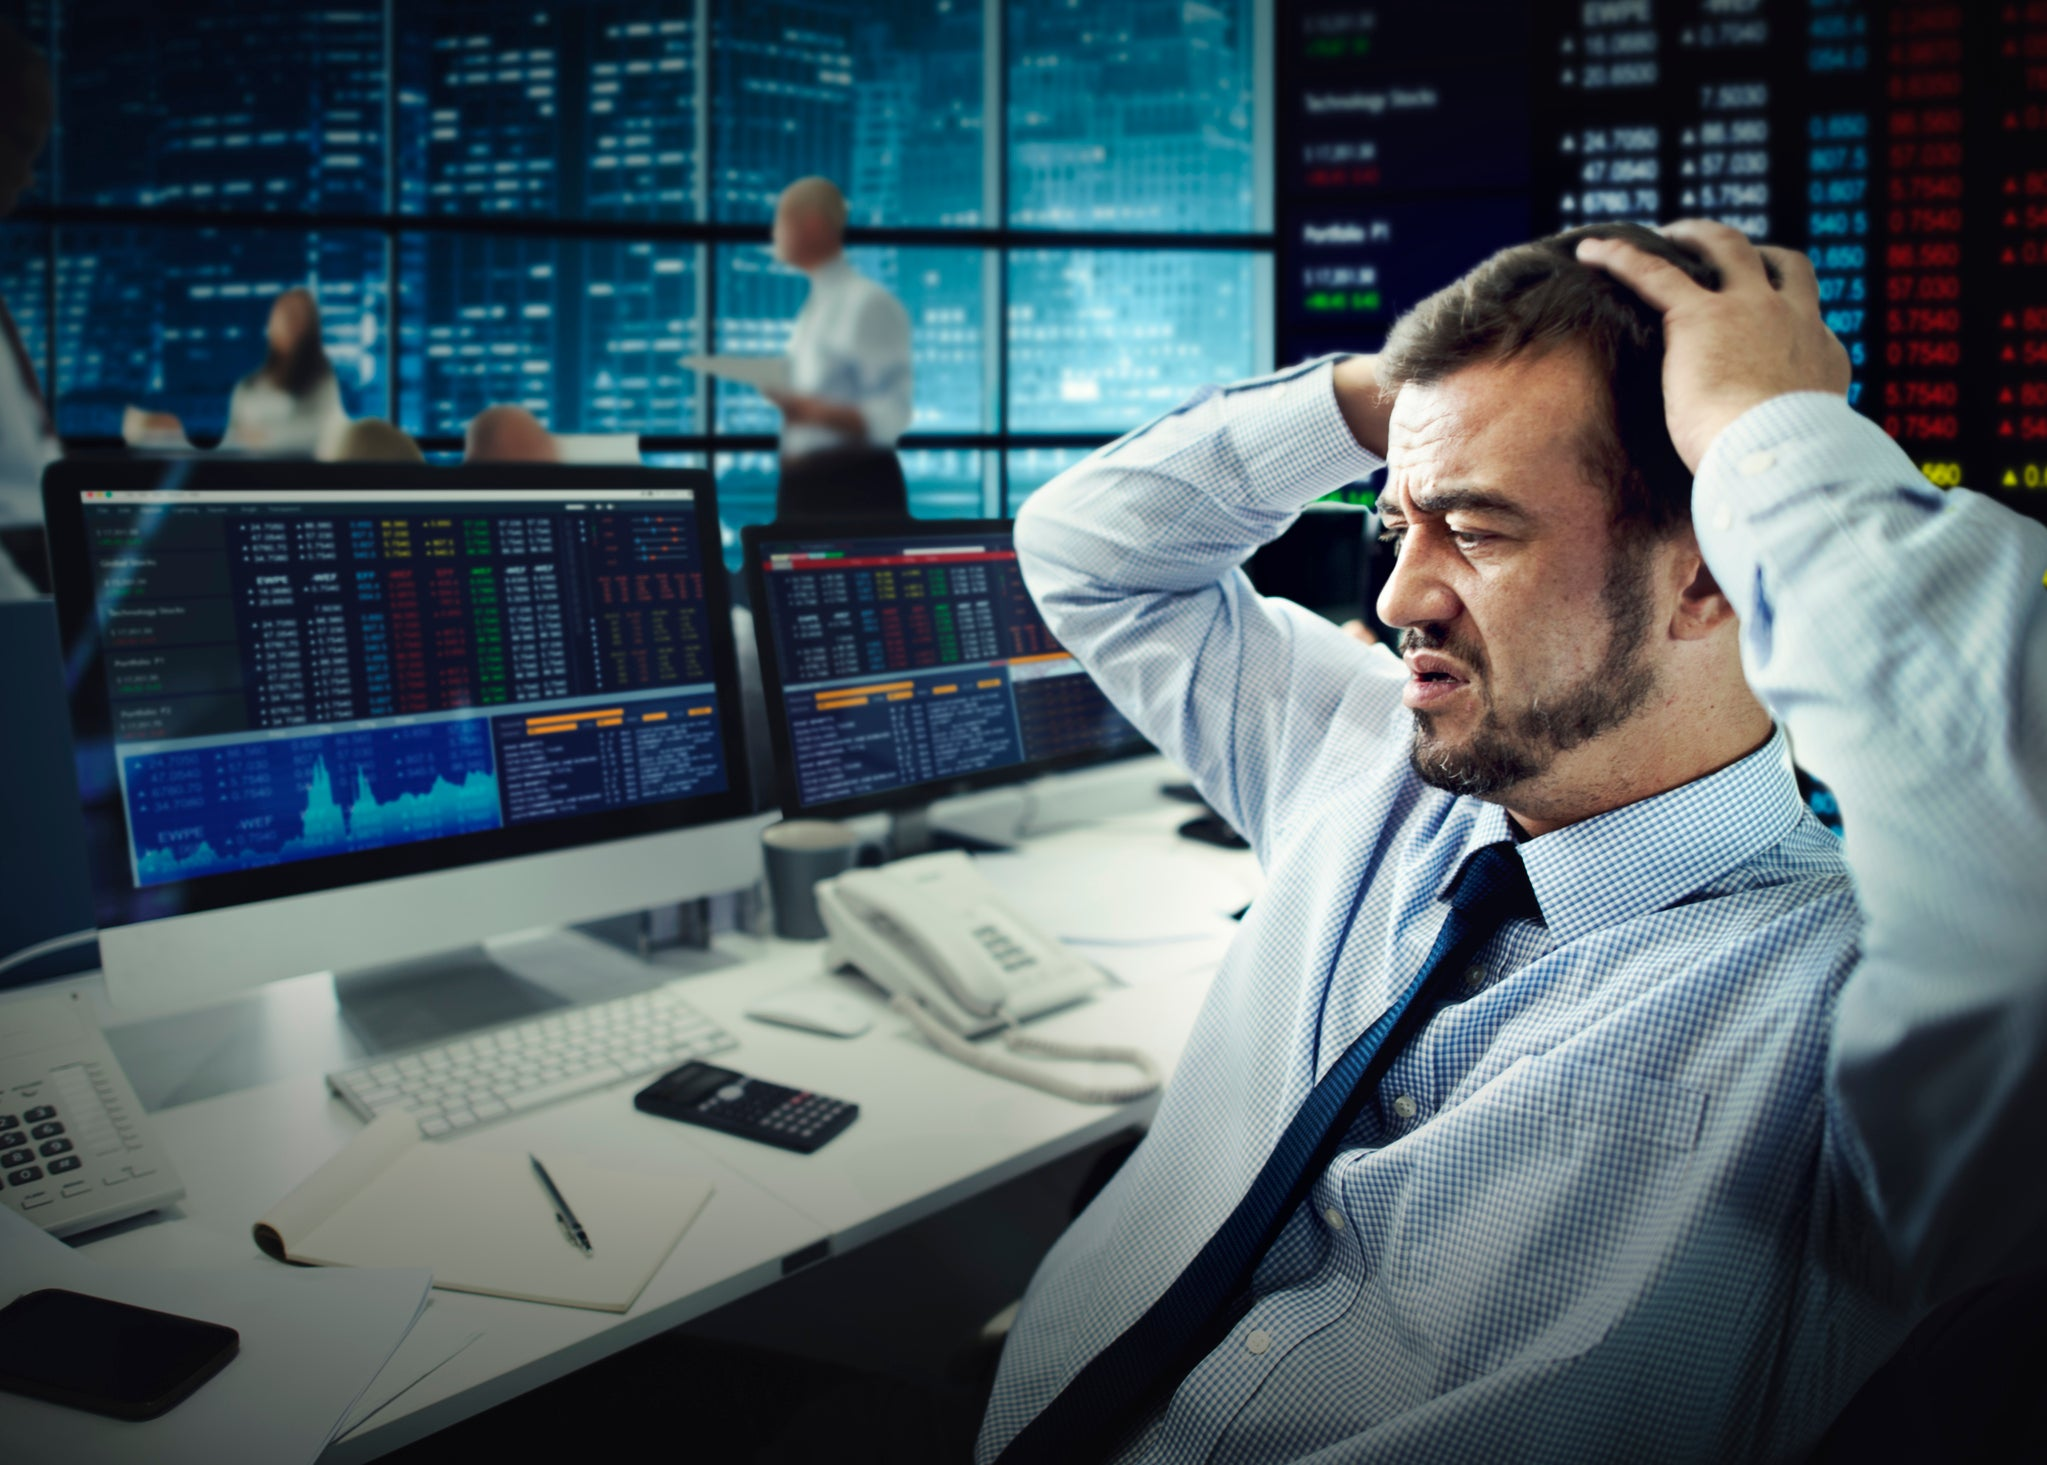 5 Ultra-Popular Stocks Wall Street Views as Overvalued - Motley Fool